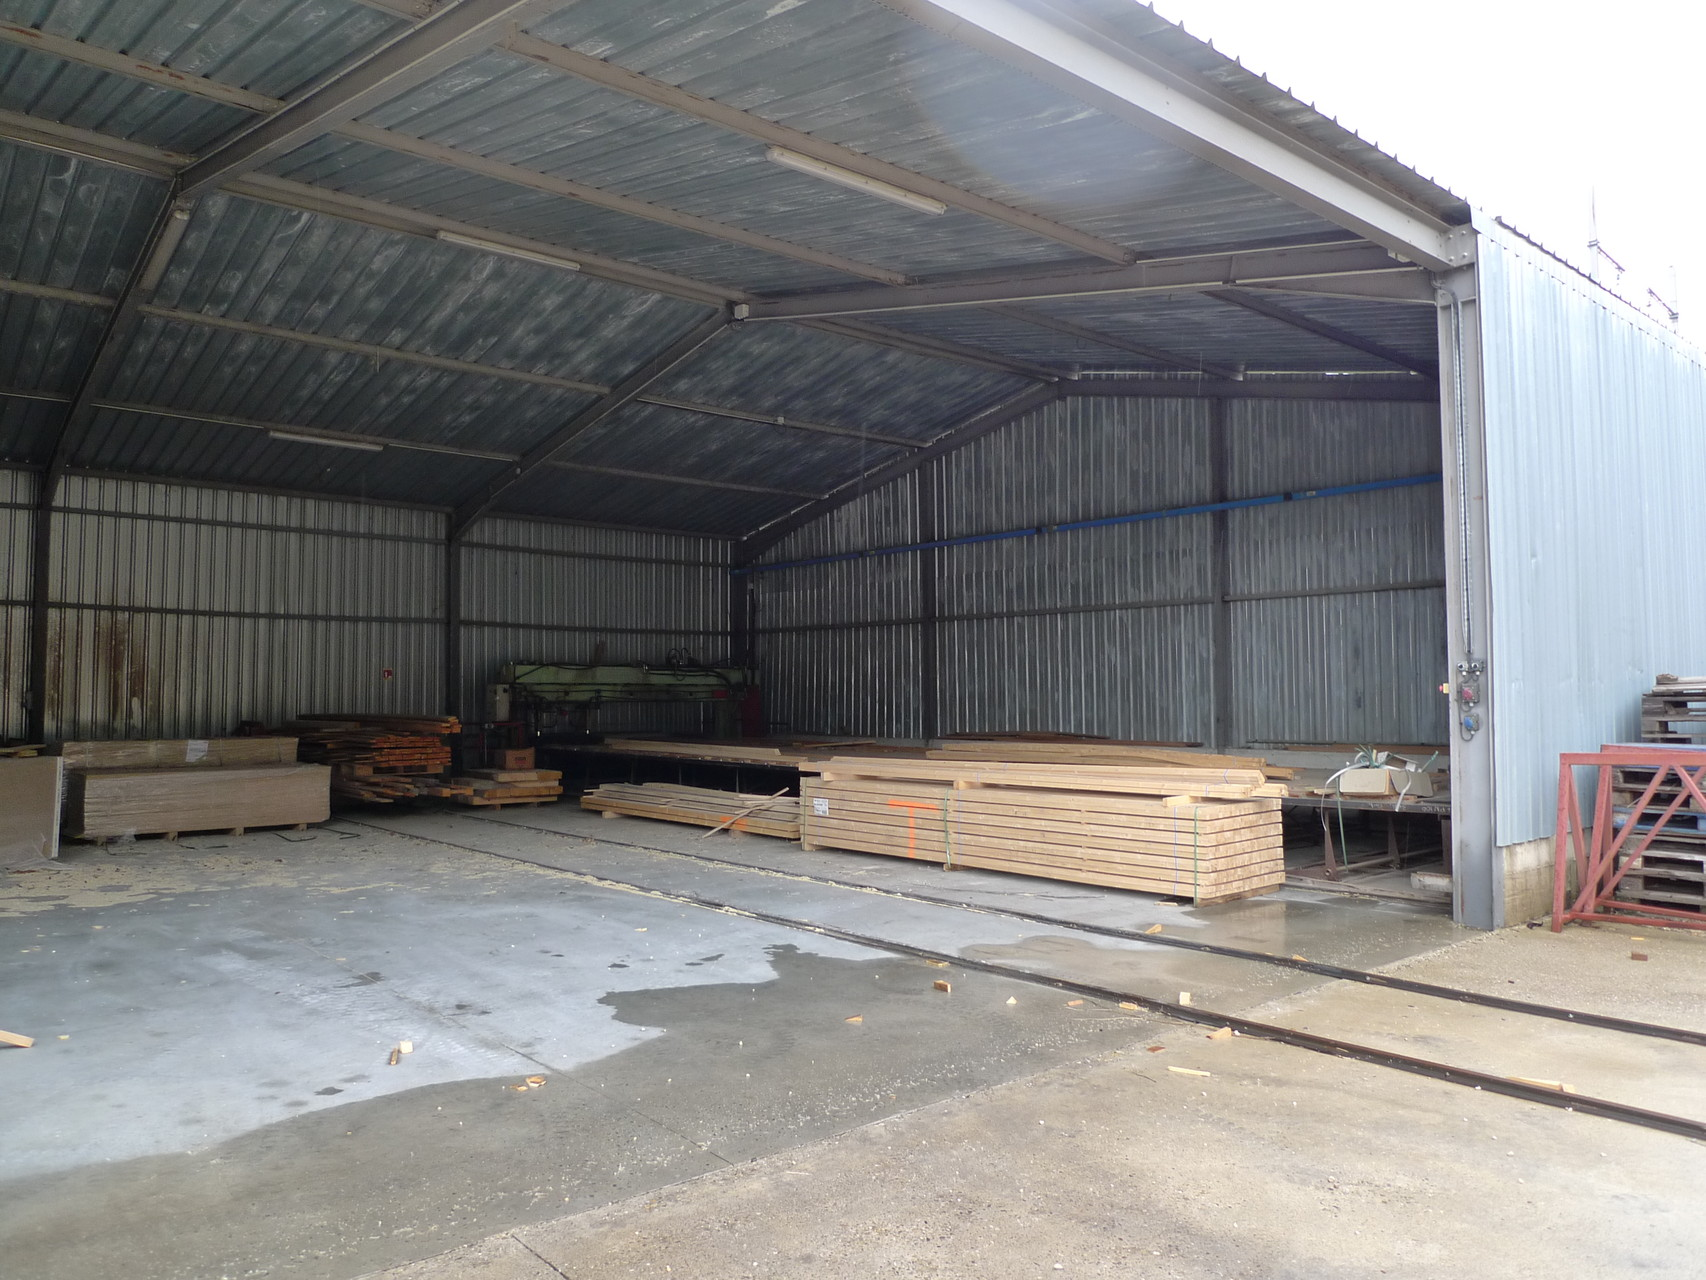 Vente hangar vaucluse entrep t 84 entrep ts vaucluse atelier a vendre vauc - Hangar a vendre nord ...